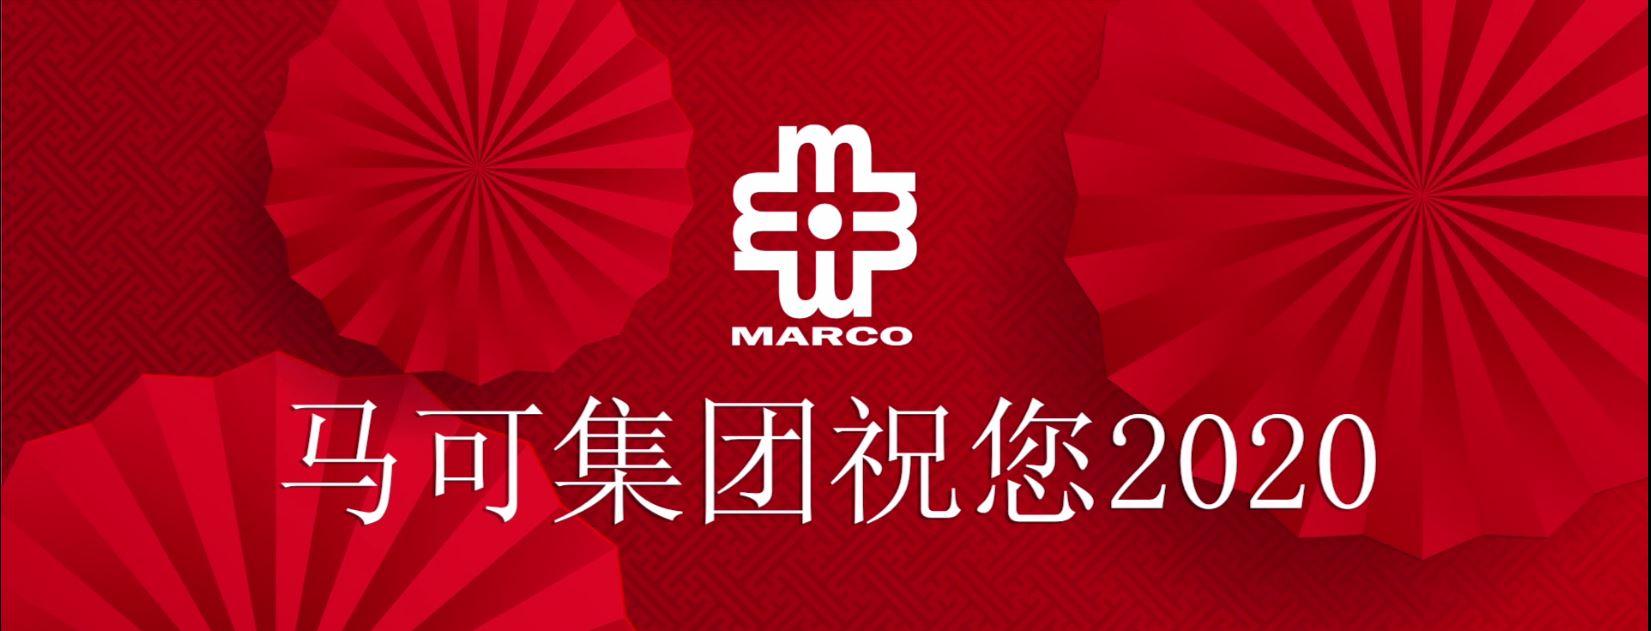 Marco CNY Greeting 2020